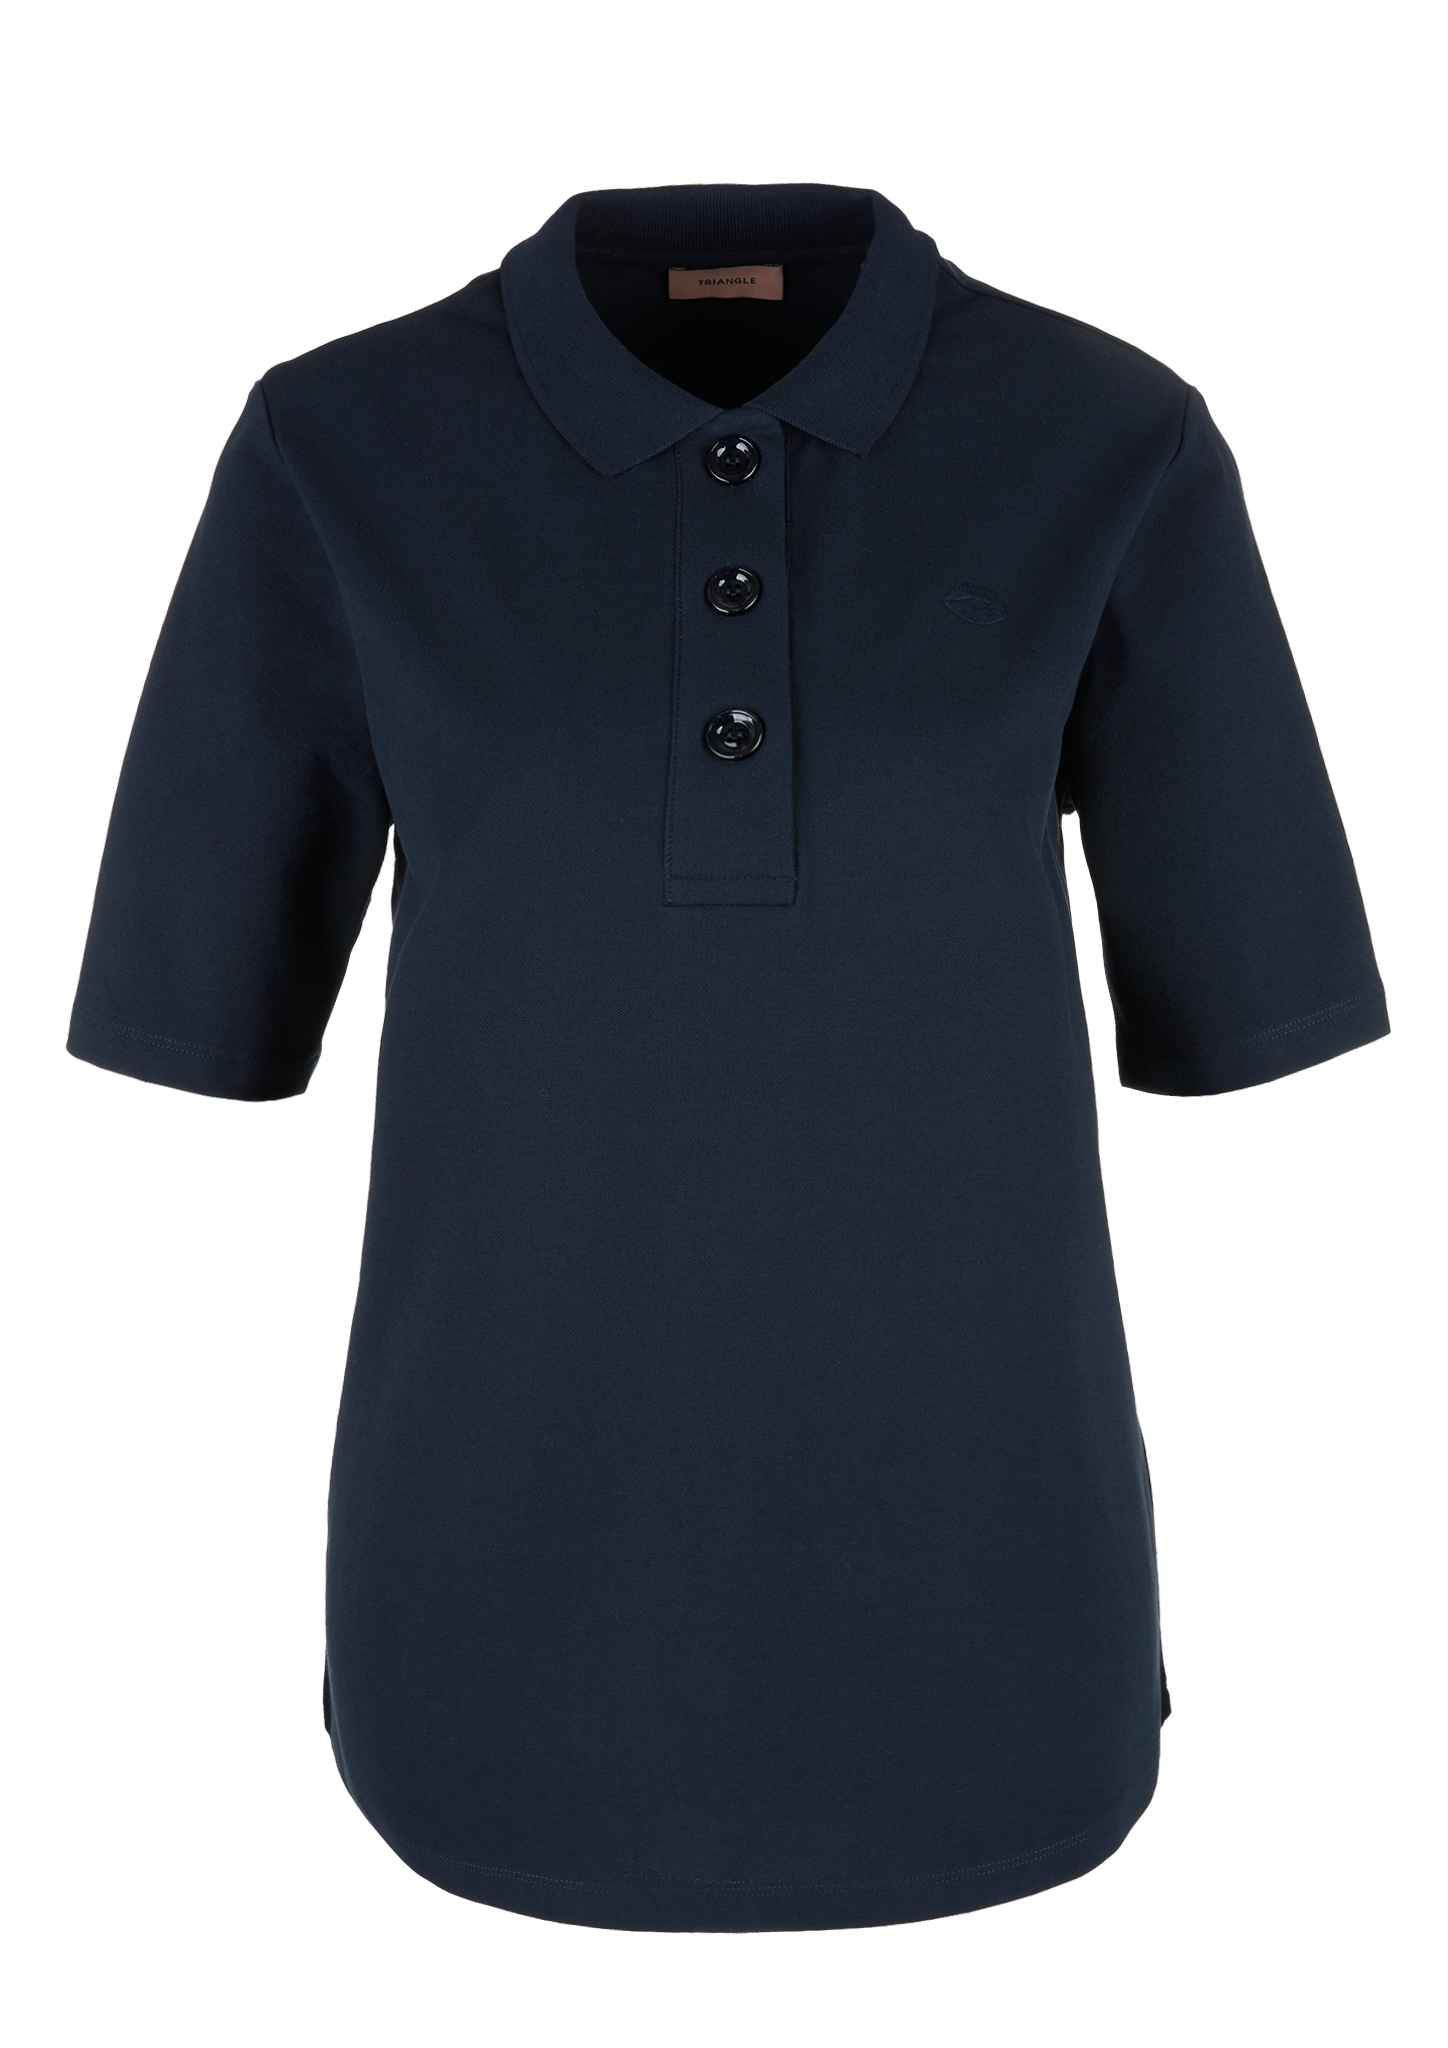 0e5e560958 Bekleidung » Damen-Shirts online kaufen | Damenmode-Suchmaschine ...